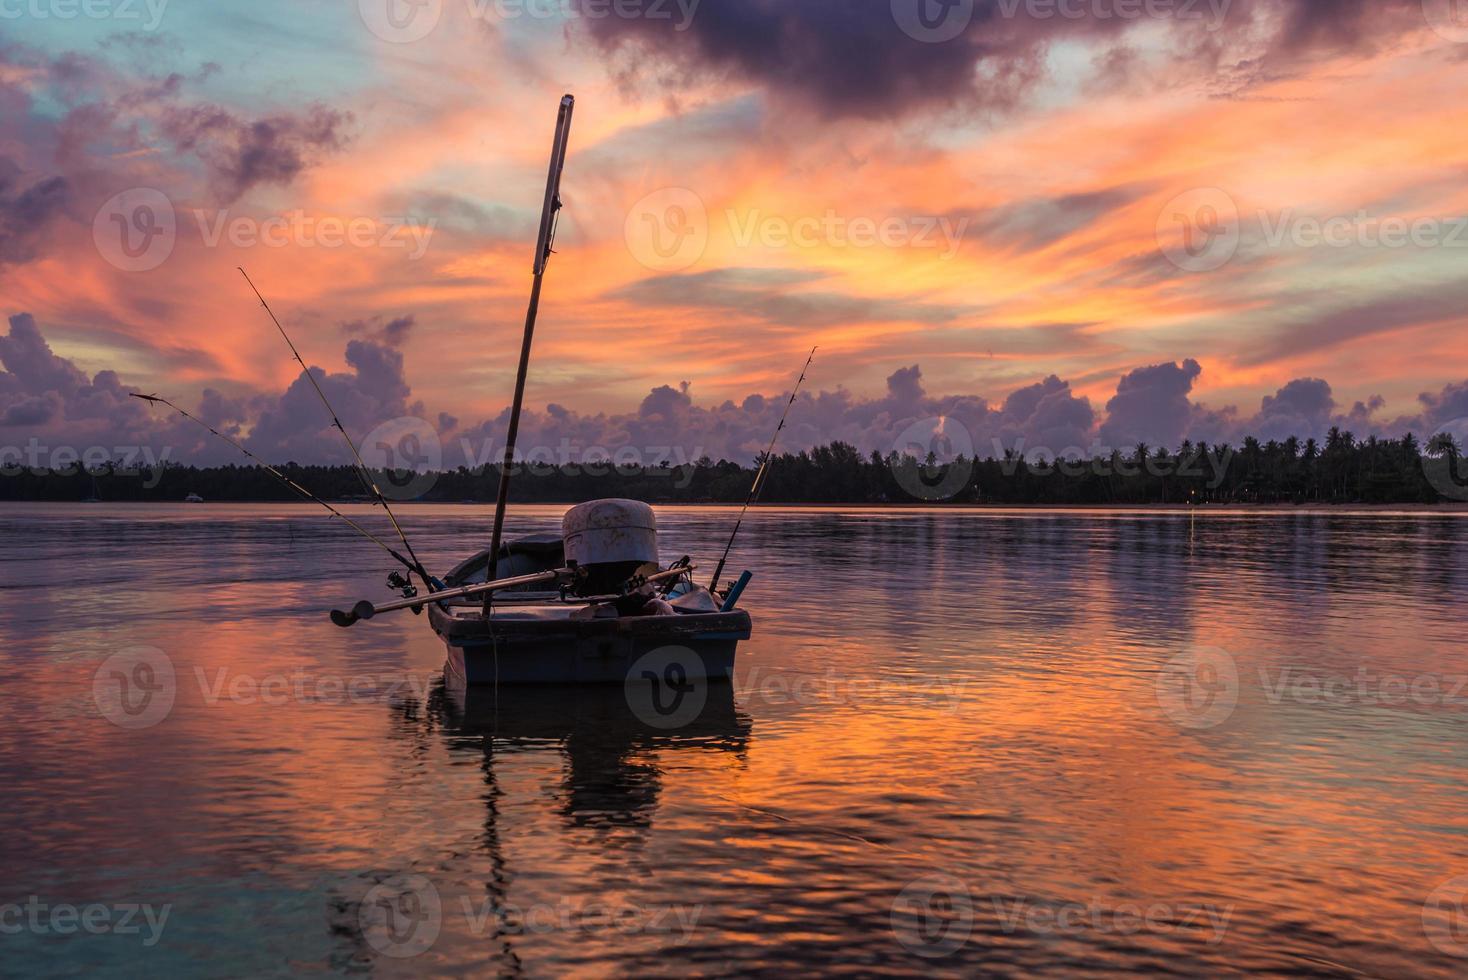 vivido cielo mattutino con barca galleggiante foto